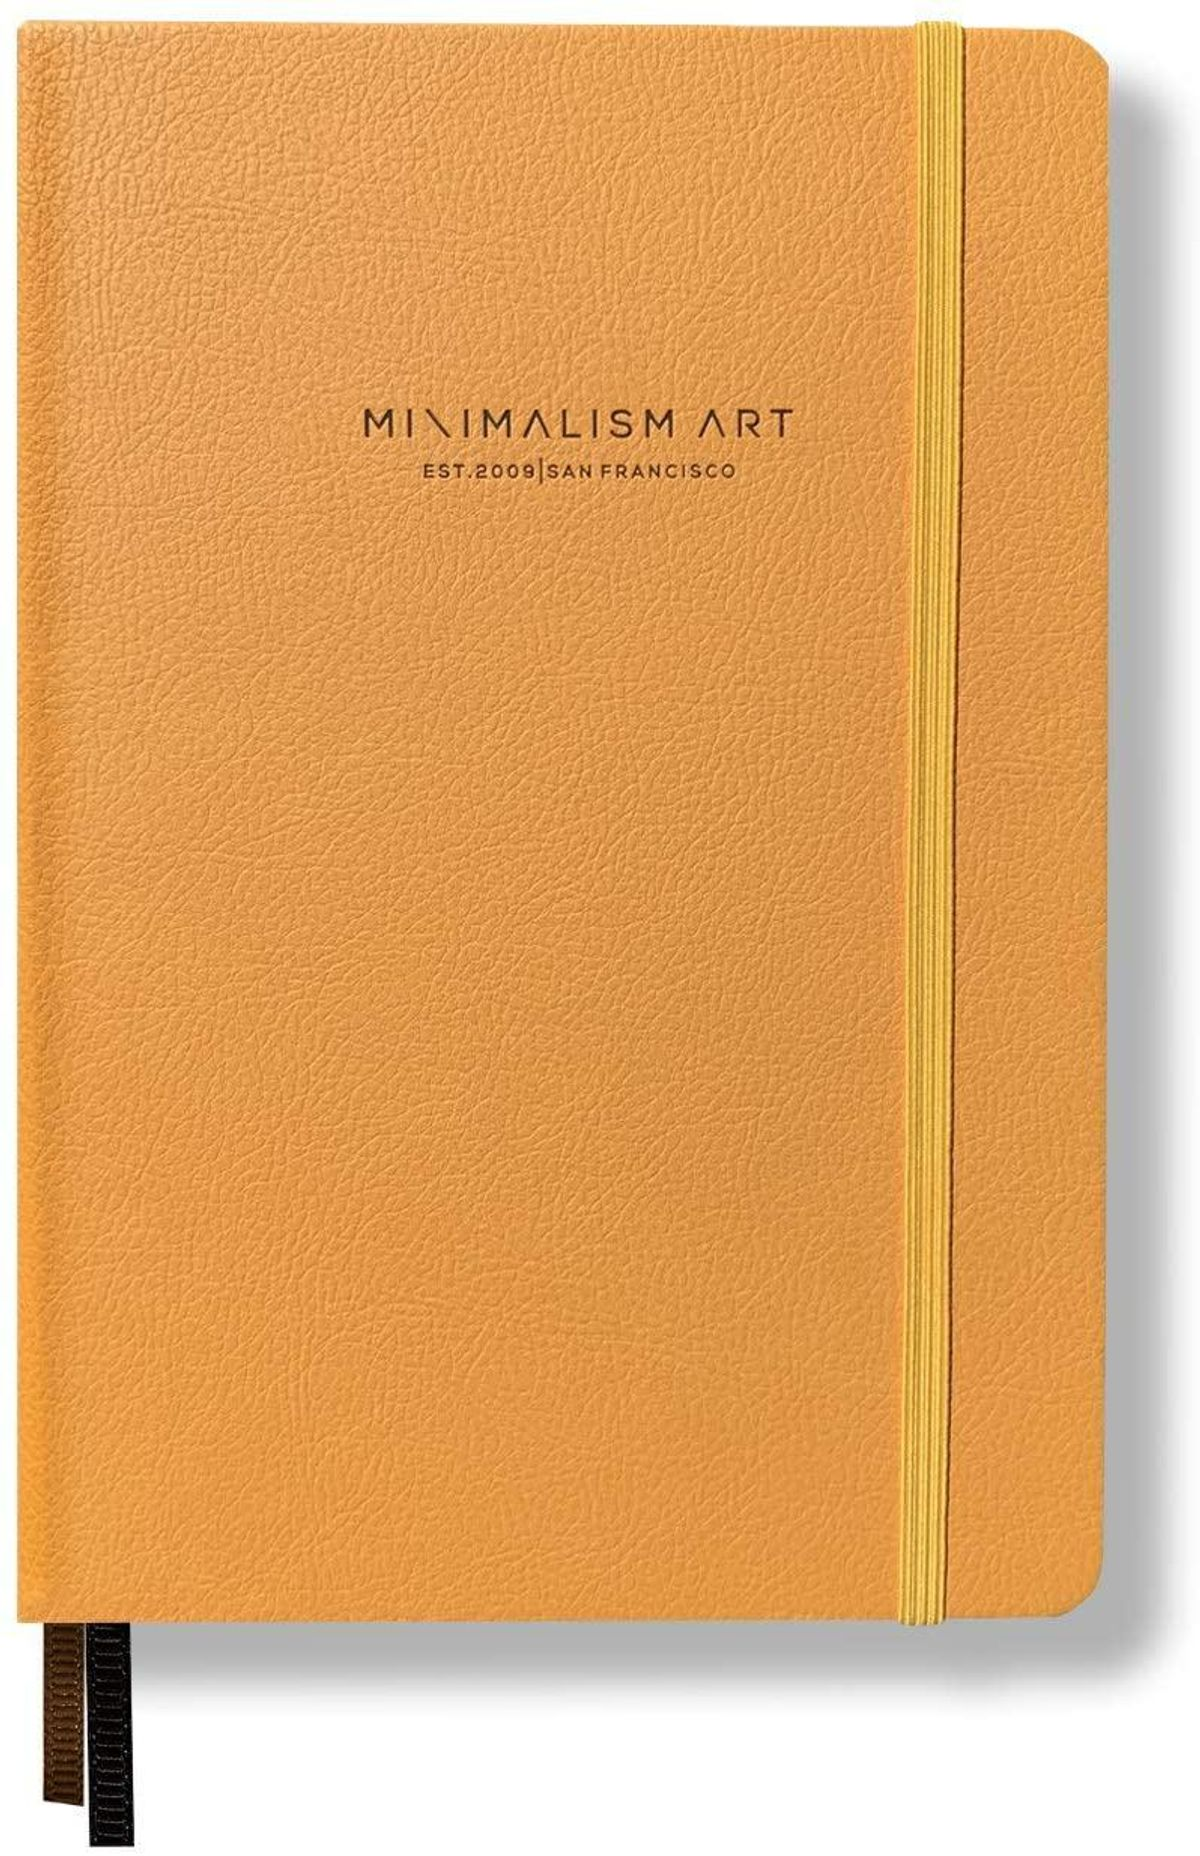 Minimalism Art